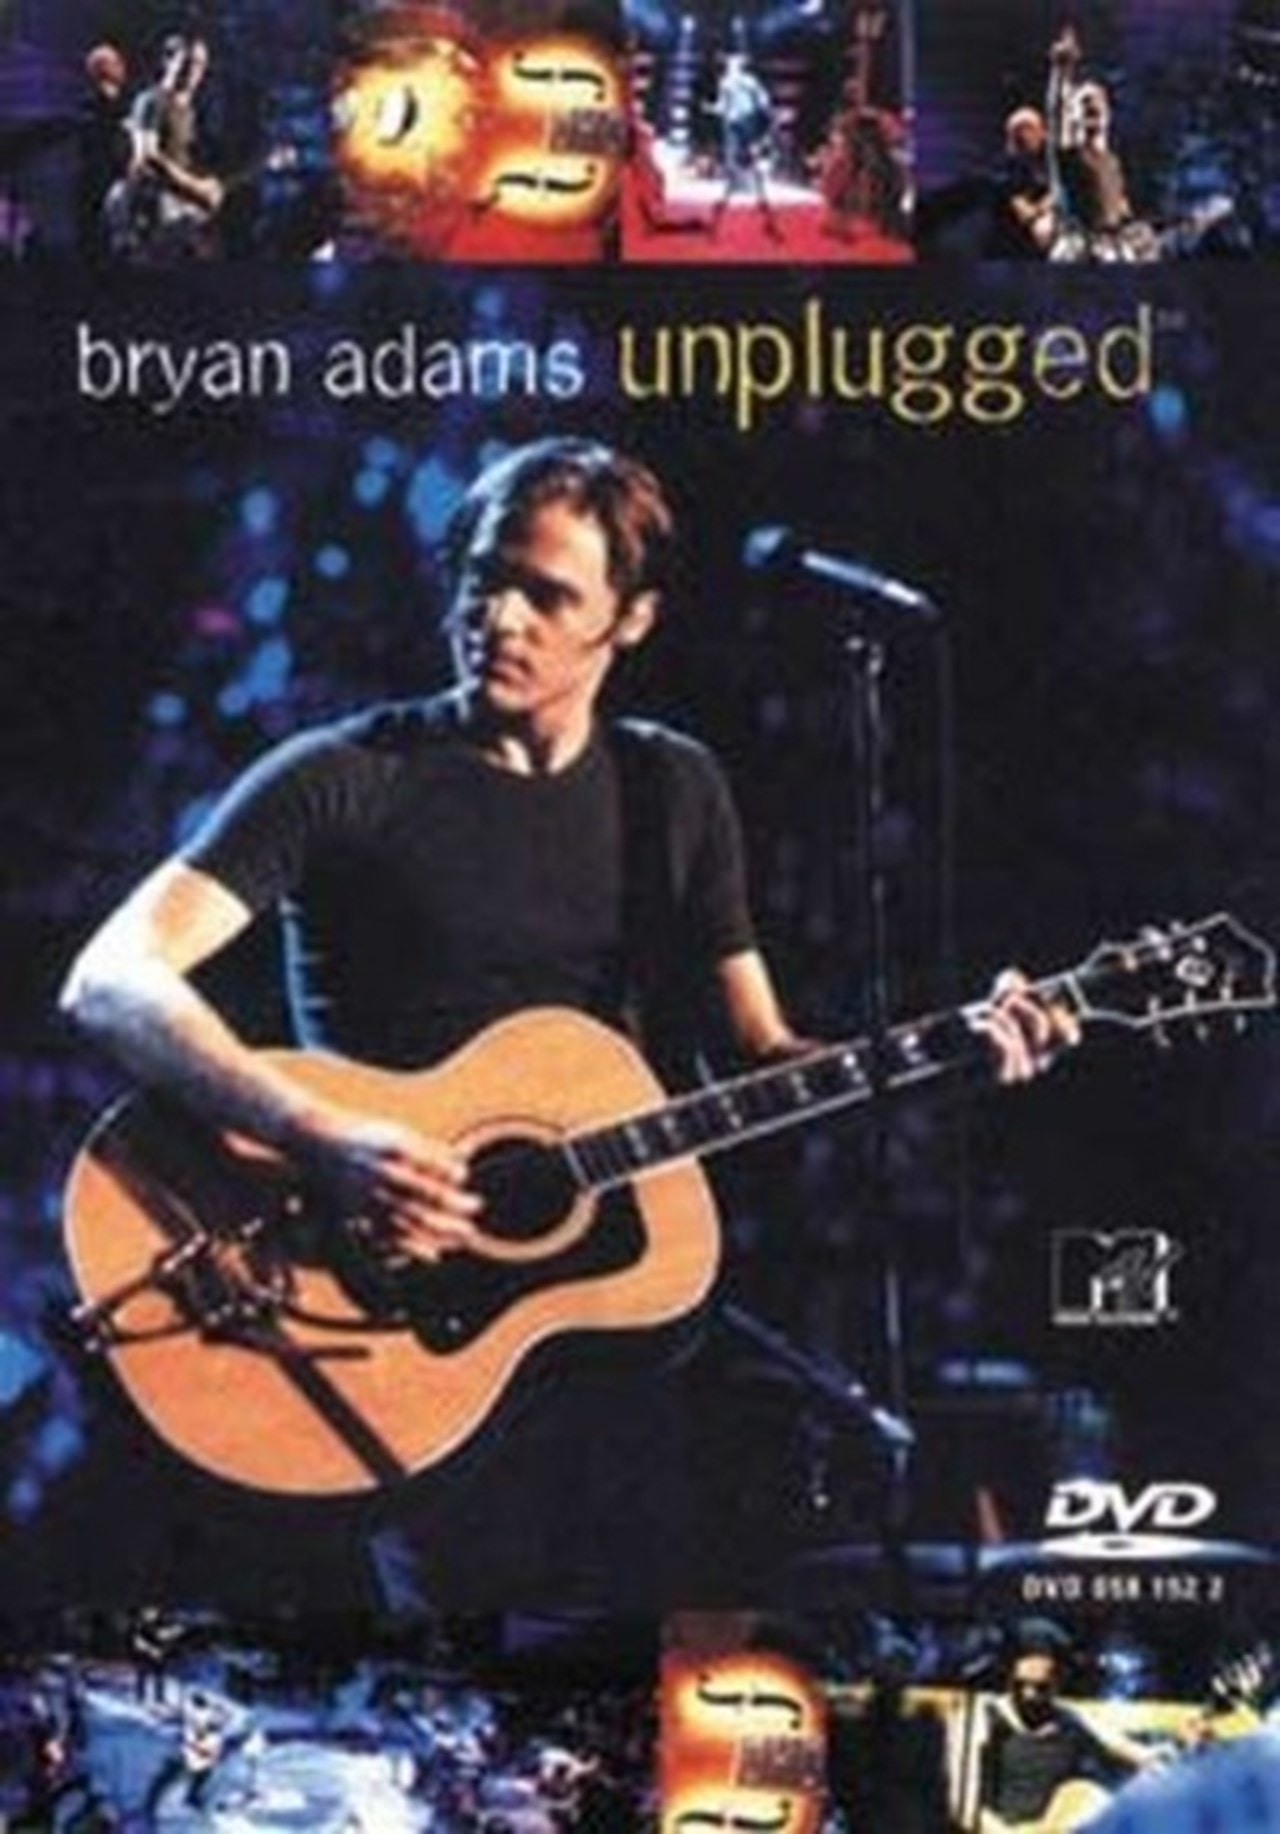 Bryan Adams: Unplugged - 1